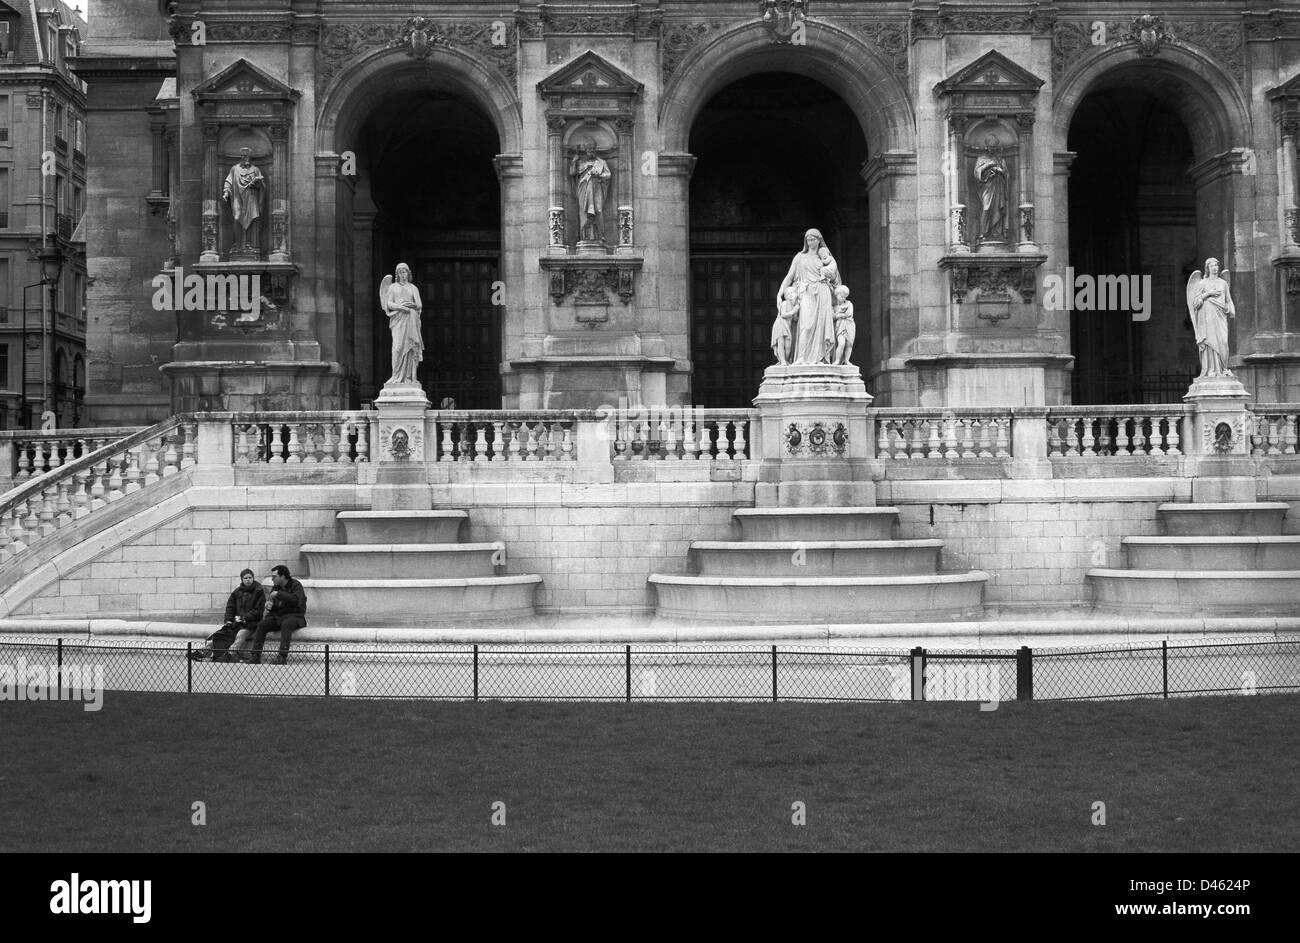 Eglise de la sainte trinite, Paris, France, black and white - Stock Image